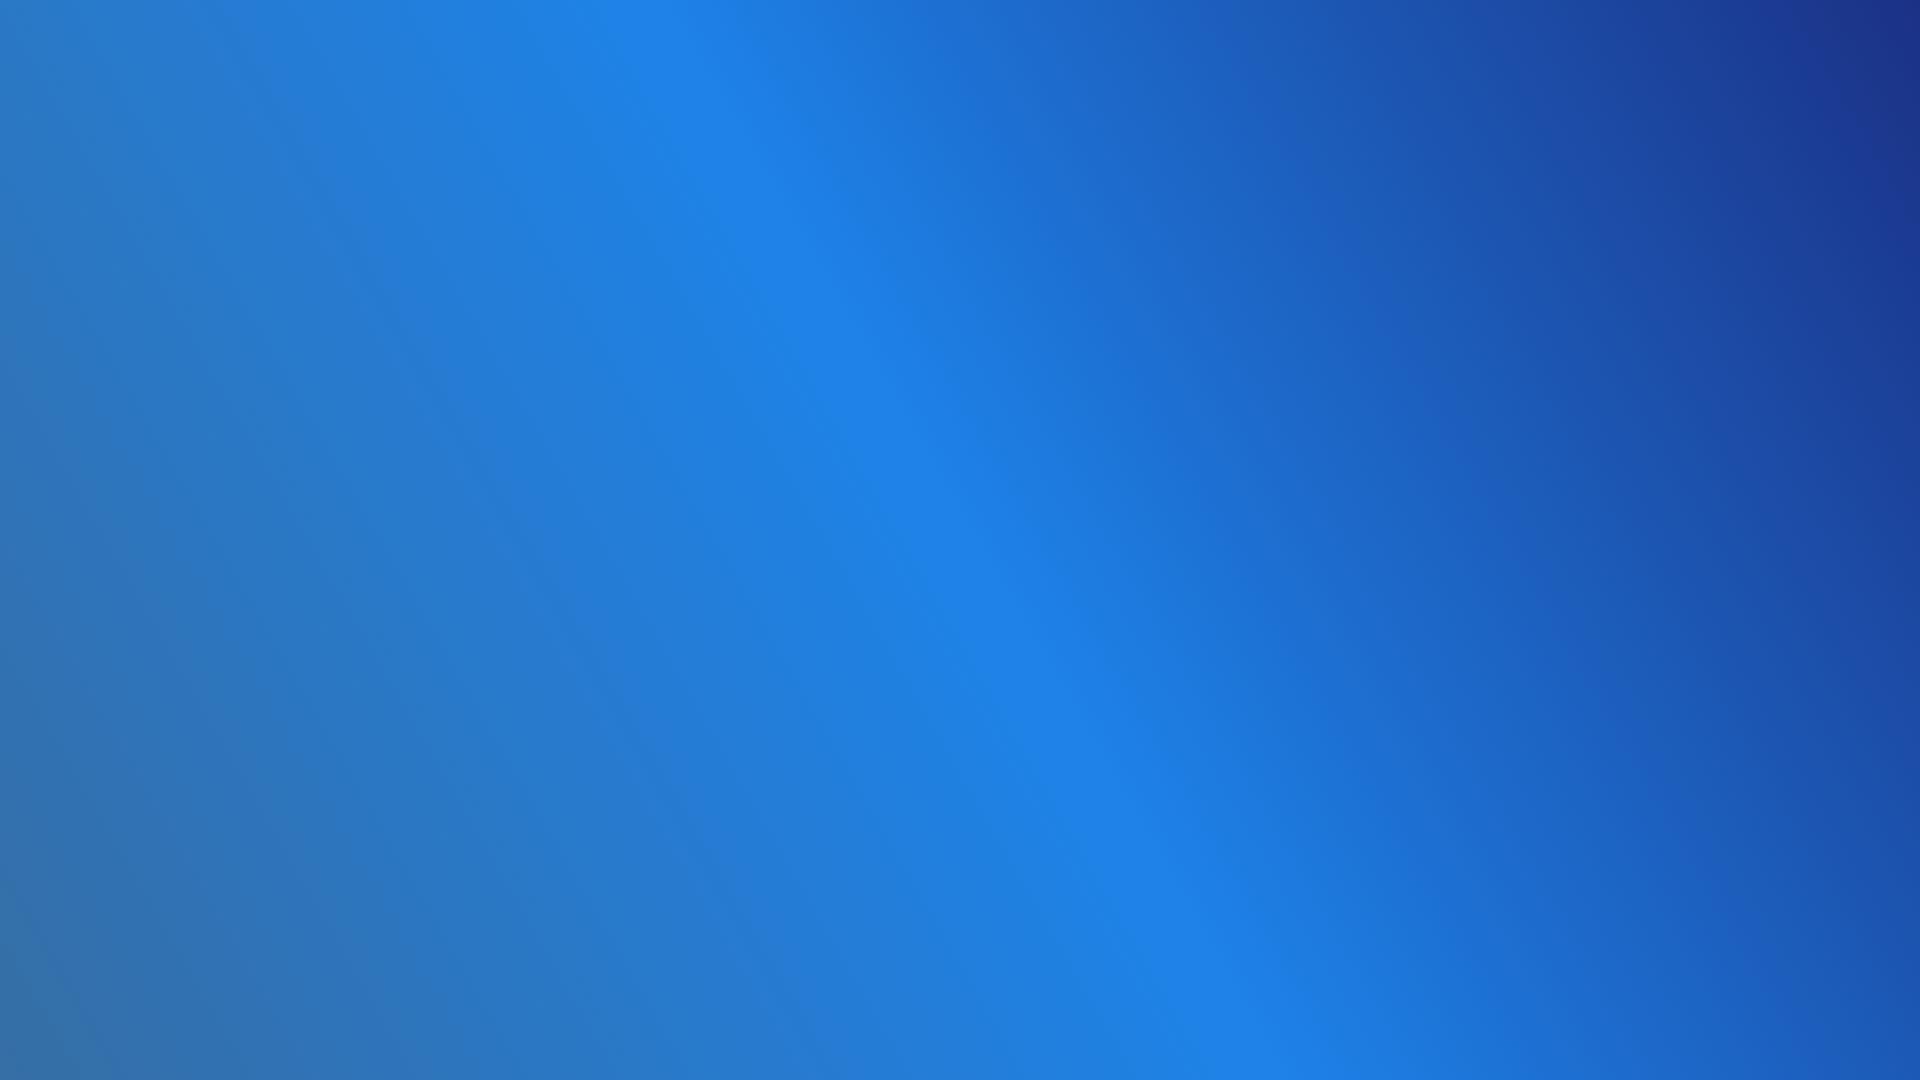 ac795c8623 Blue Gradient Background. Download Gradient Background (PNG)